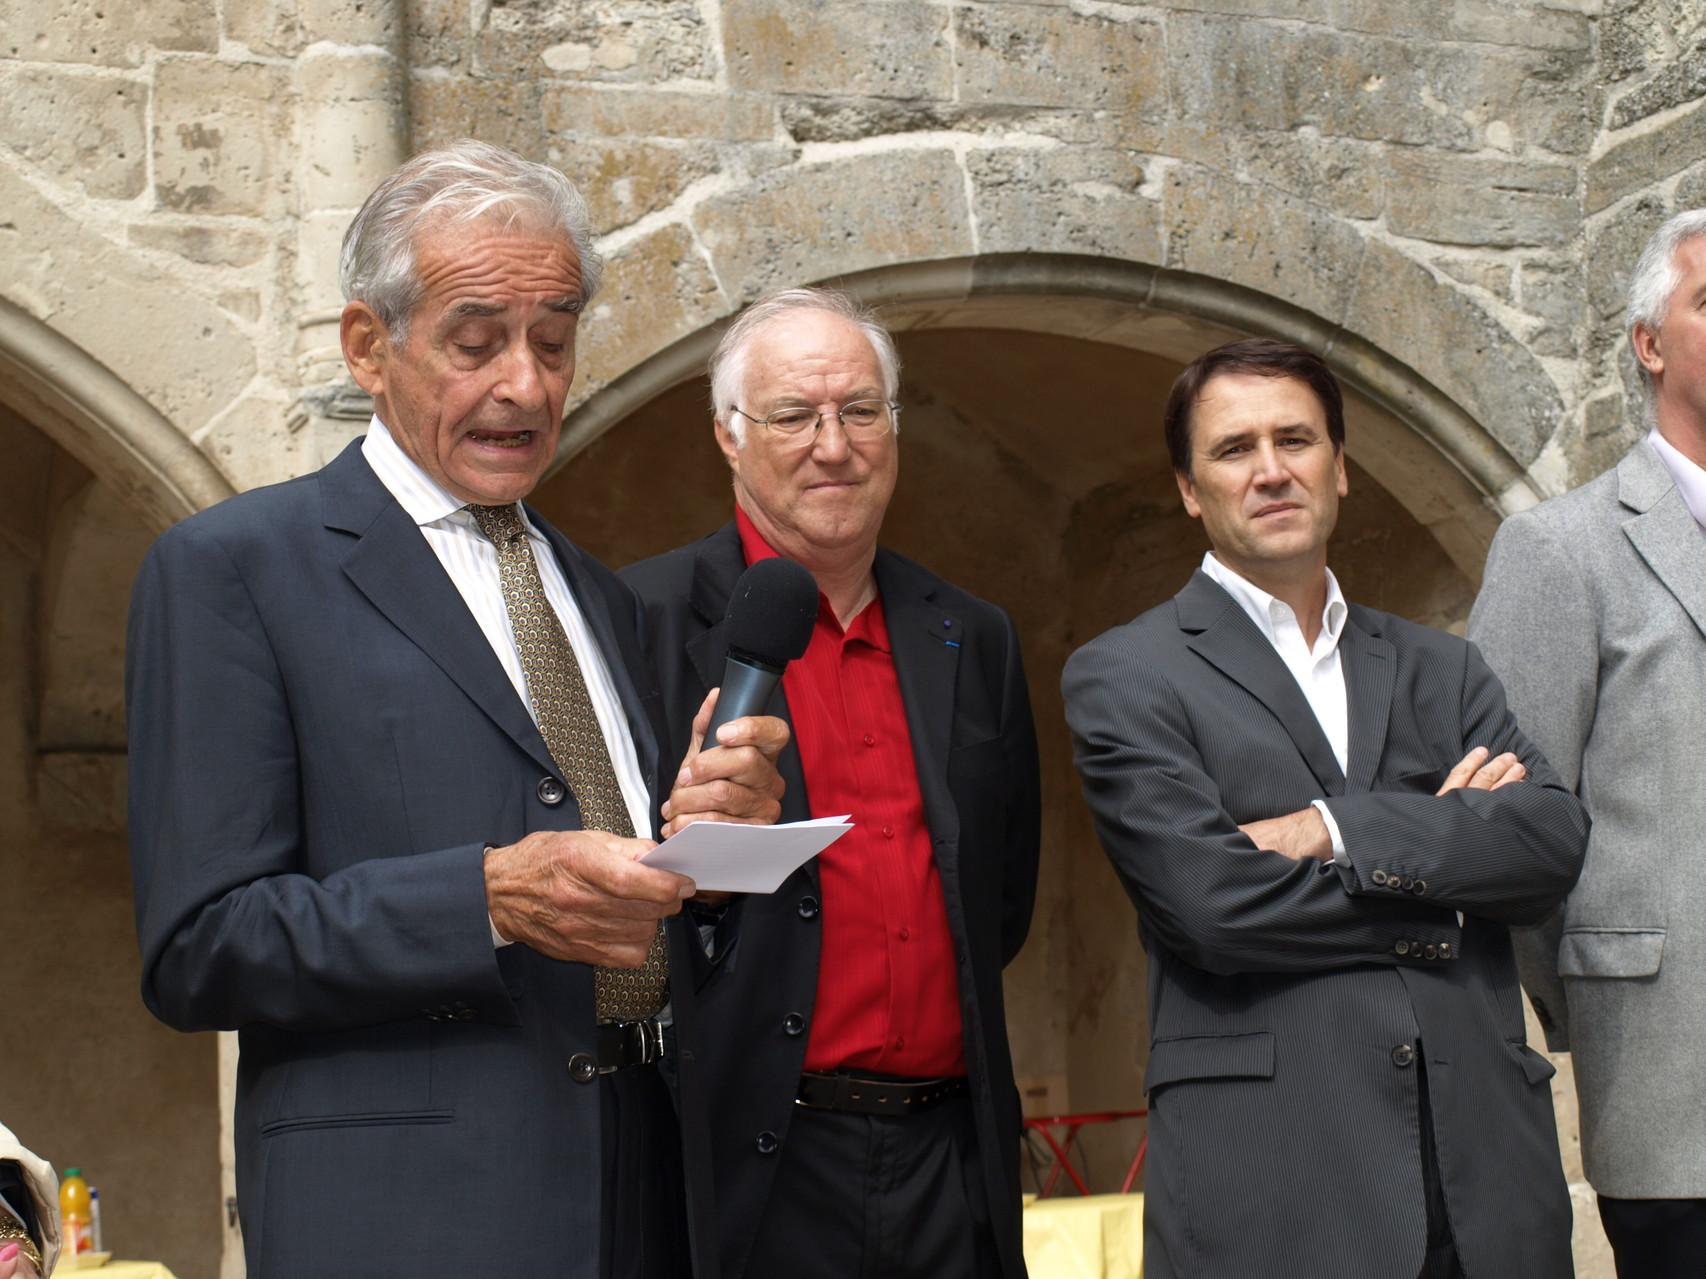 avec Jean Nicolas Plume d'or 2011 (sept 2010)